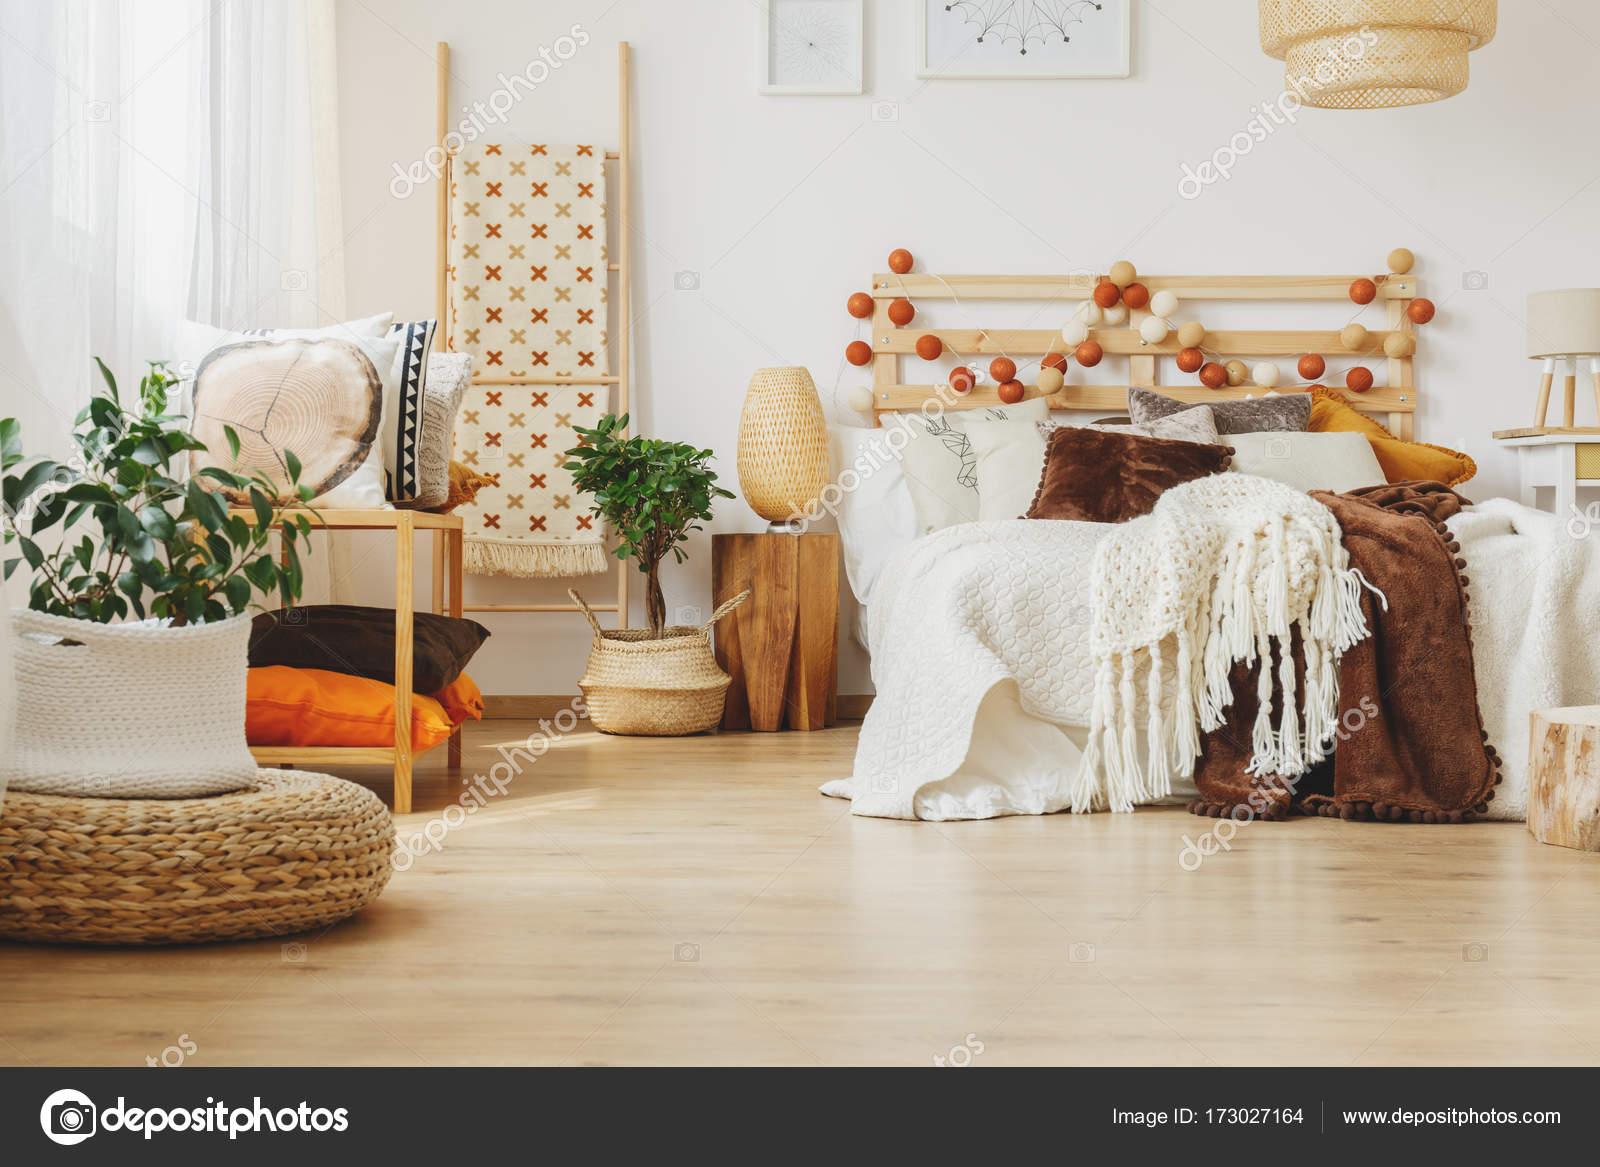 https://st3.depositphotos.com/2249091/17302/i/1600/depositphotos_173027164-stockafbeelding-mooi-scandinavische-slaapkamer.jpg